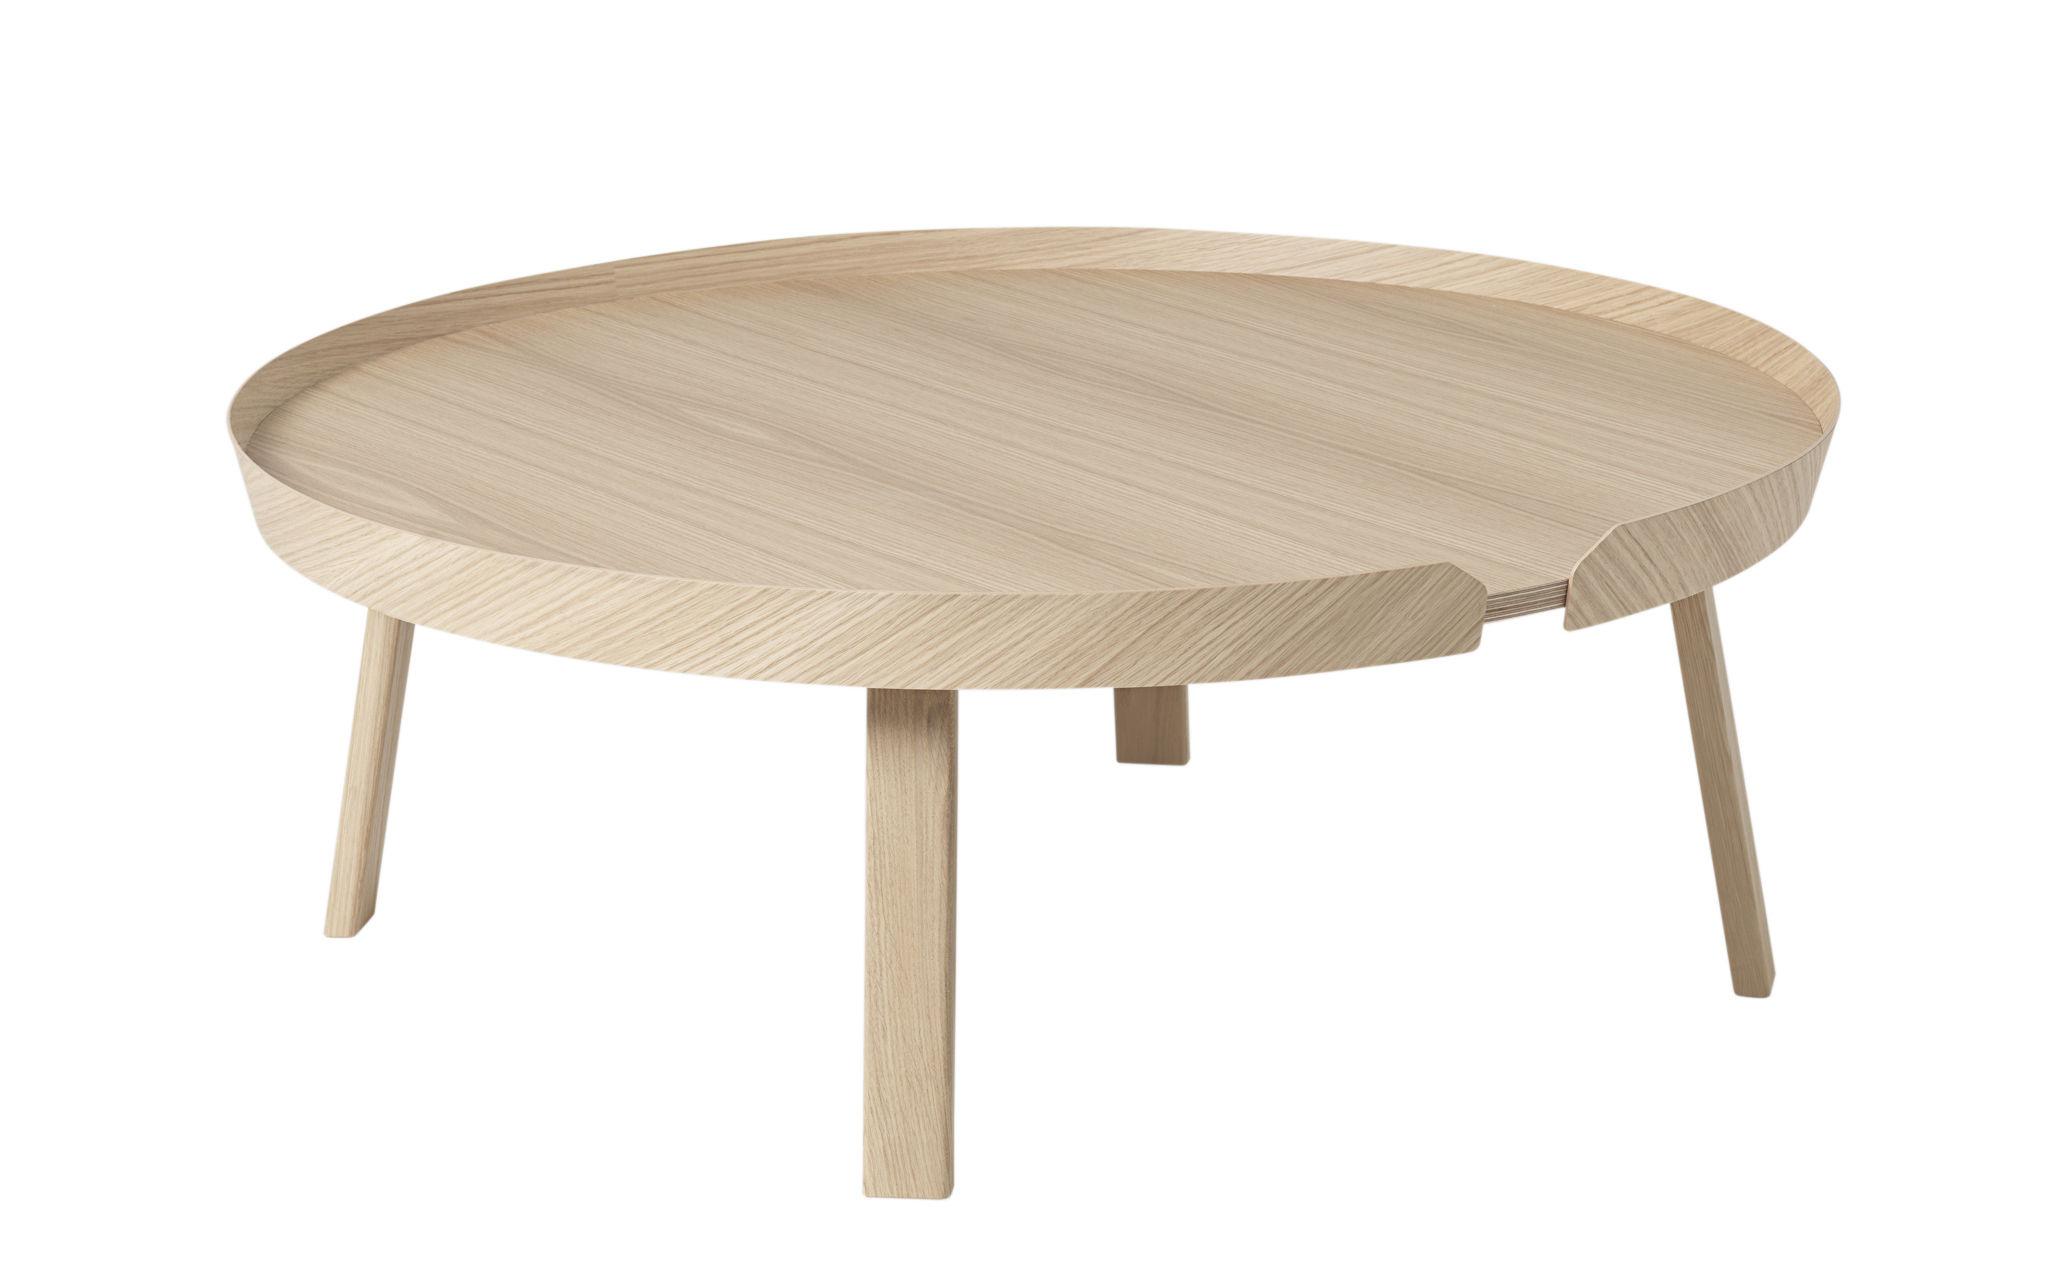 Mobilier - Tables basses - Table basse Around XL / Ø 95 x H 36 cm - Muuto - Chêne naturel - Frêne teinté